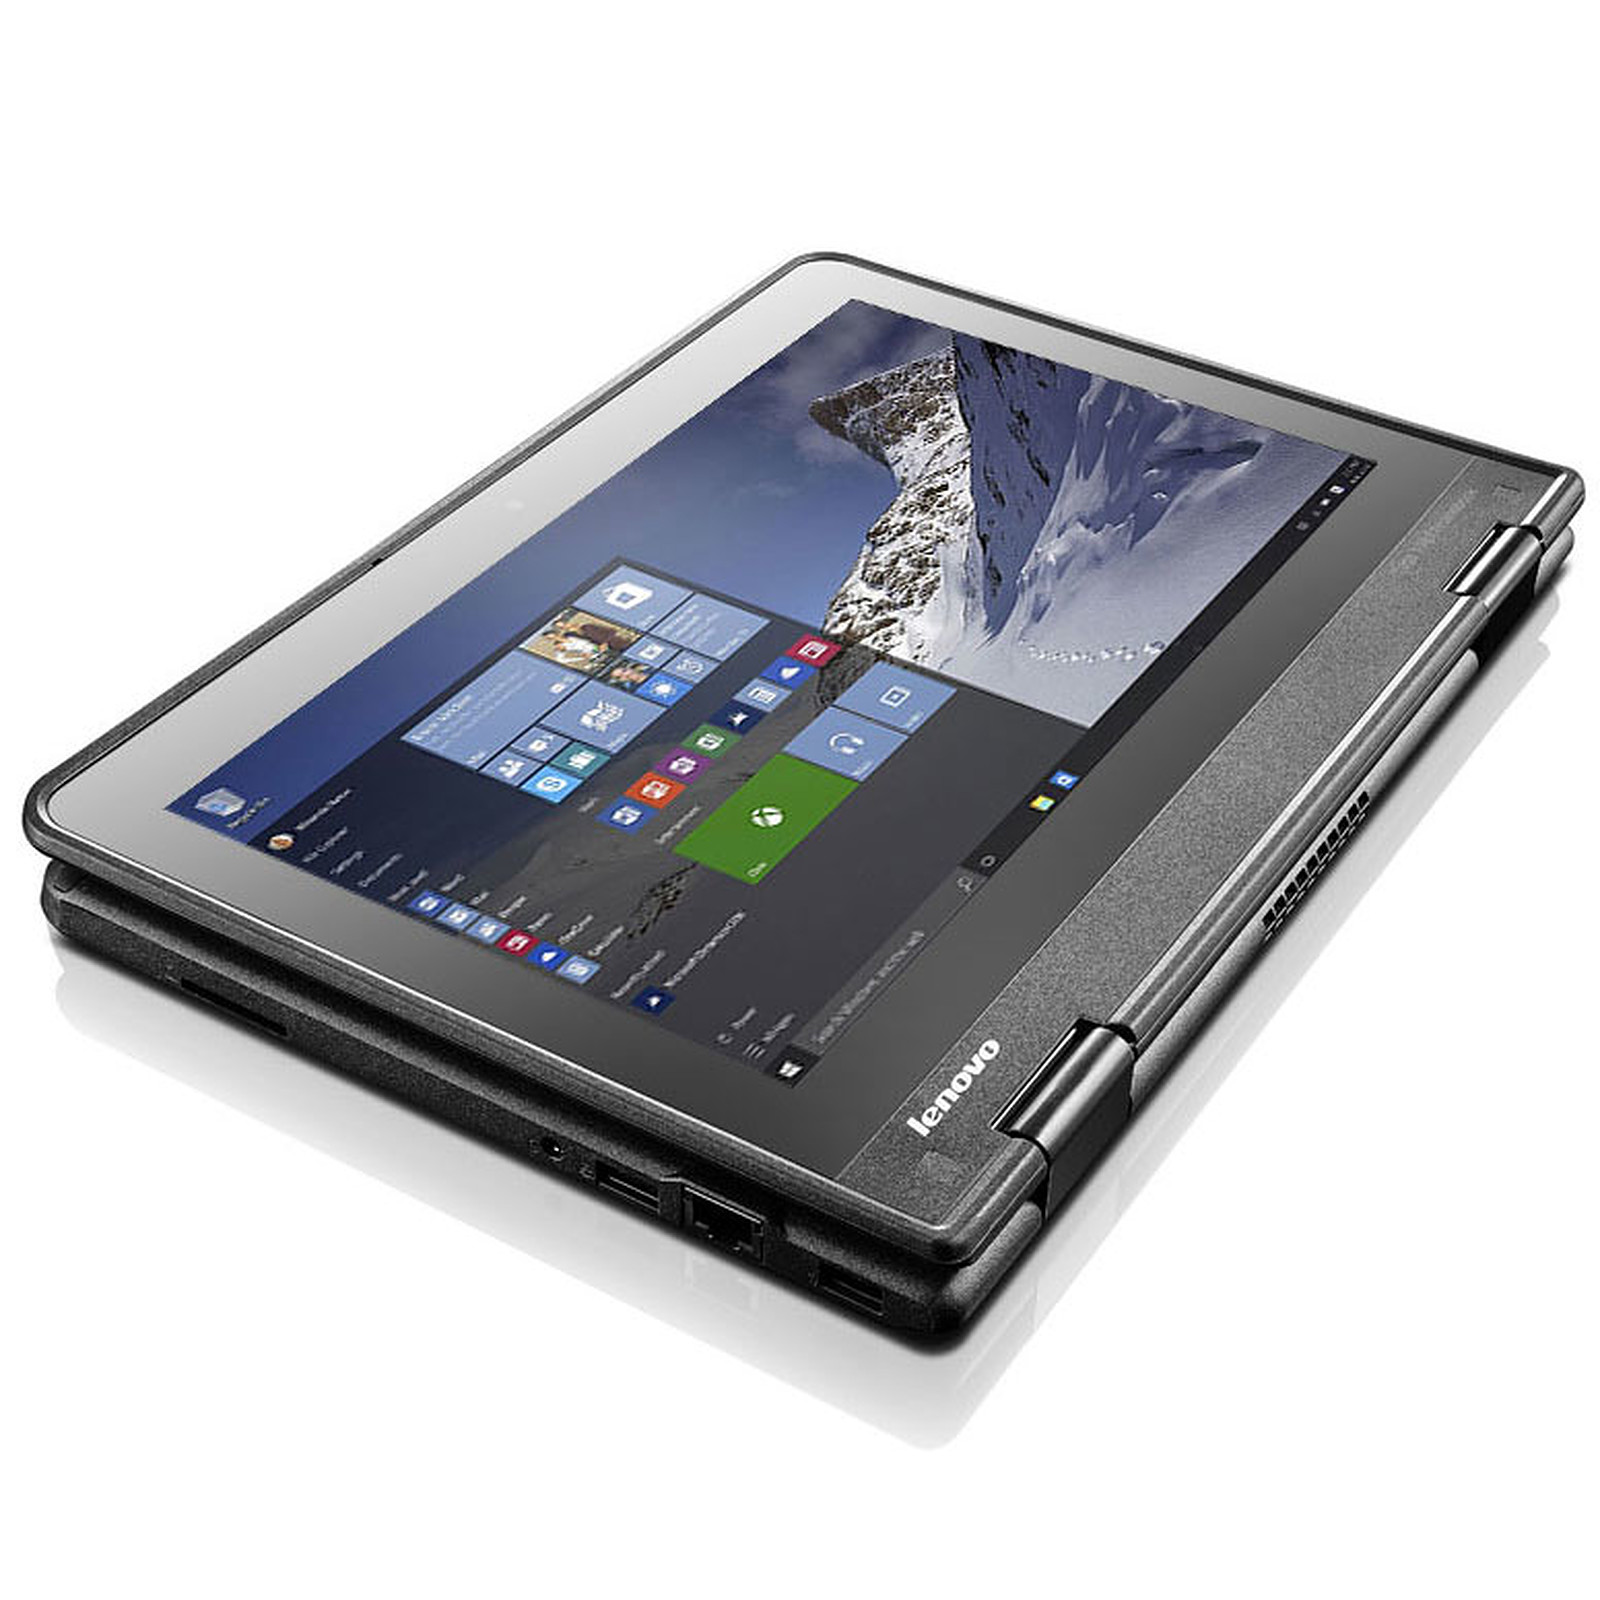 Lenovo Thinkpad Yoga 11e 20d9002afr Pc Portable Lenovo Sur Ldlc Com Muséericorde